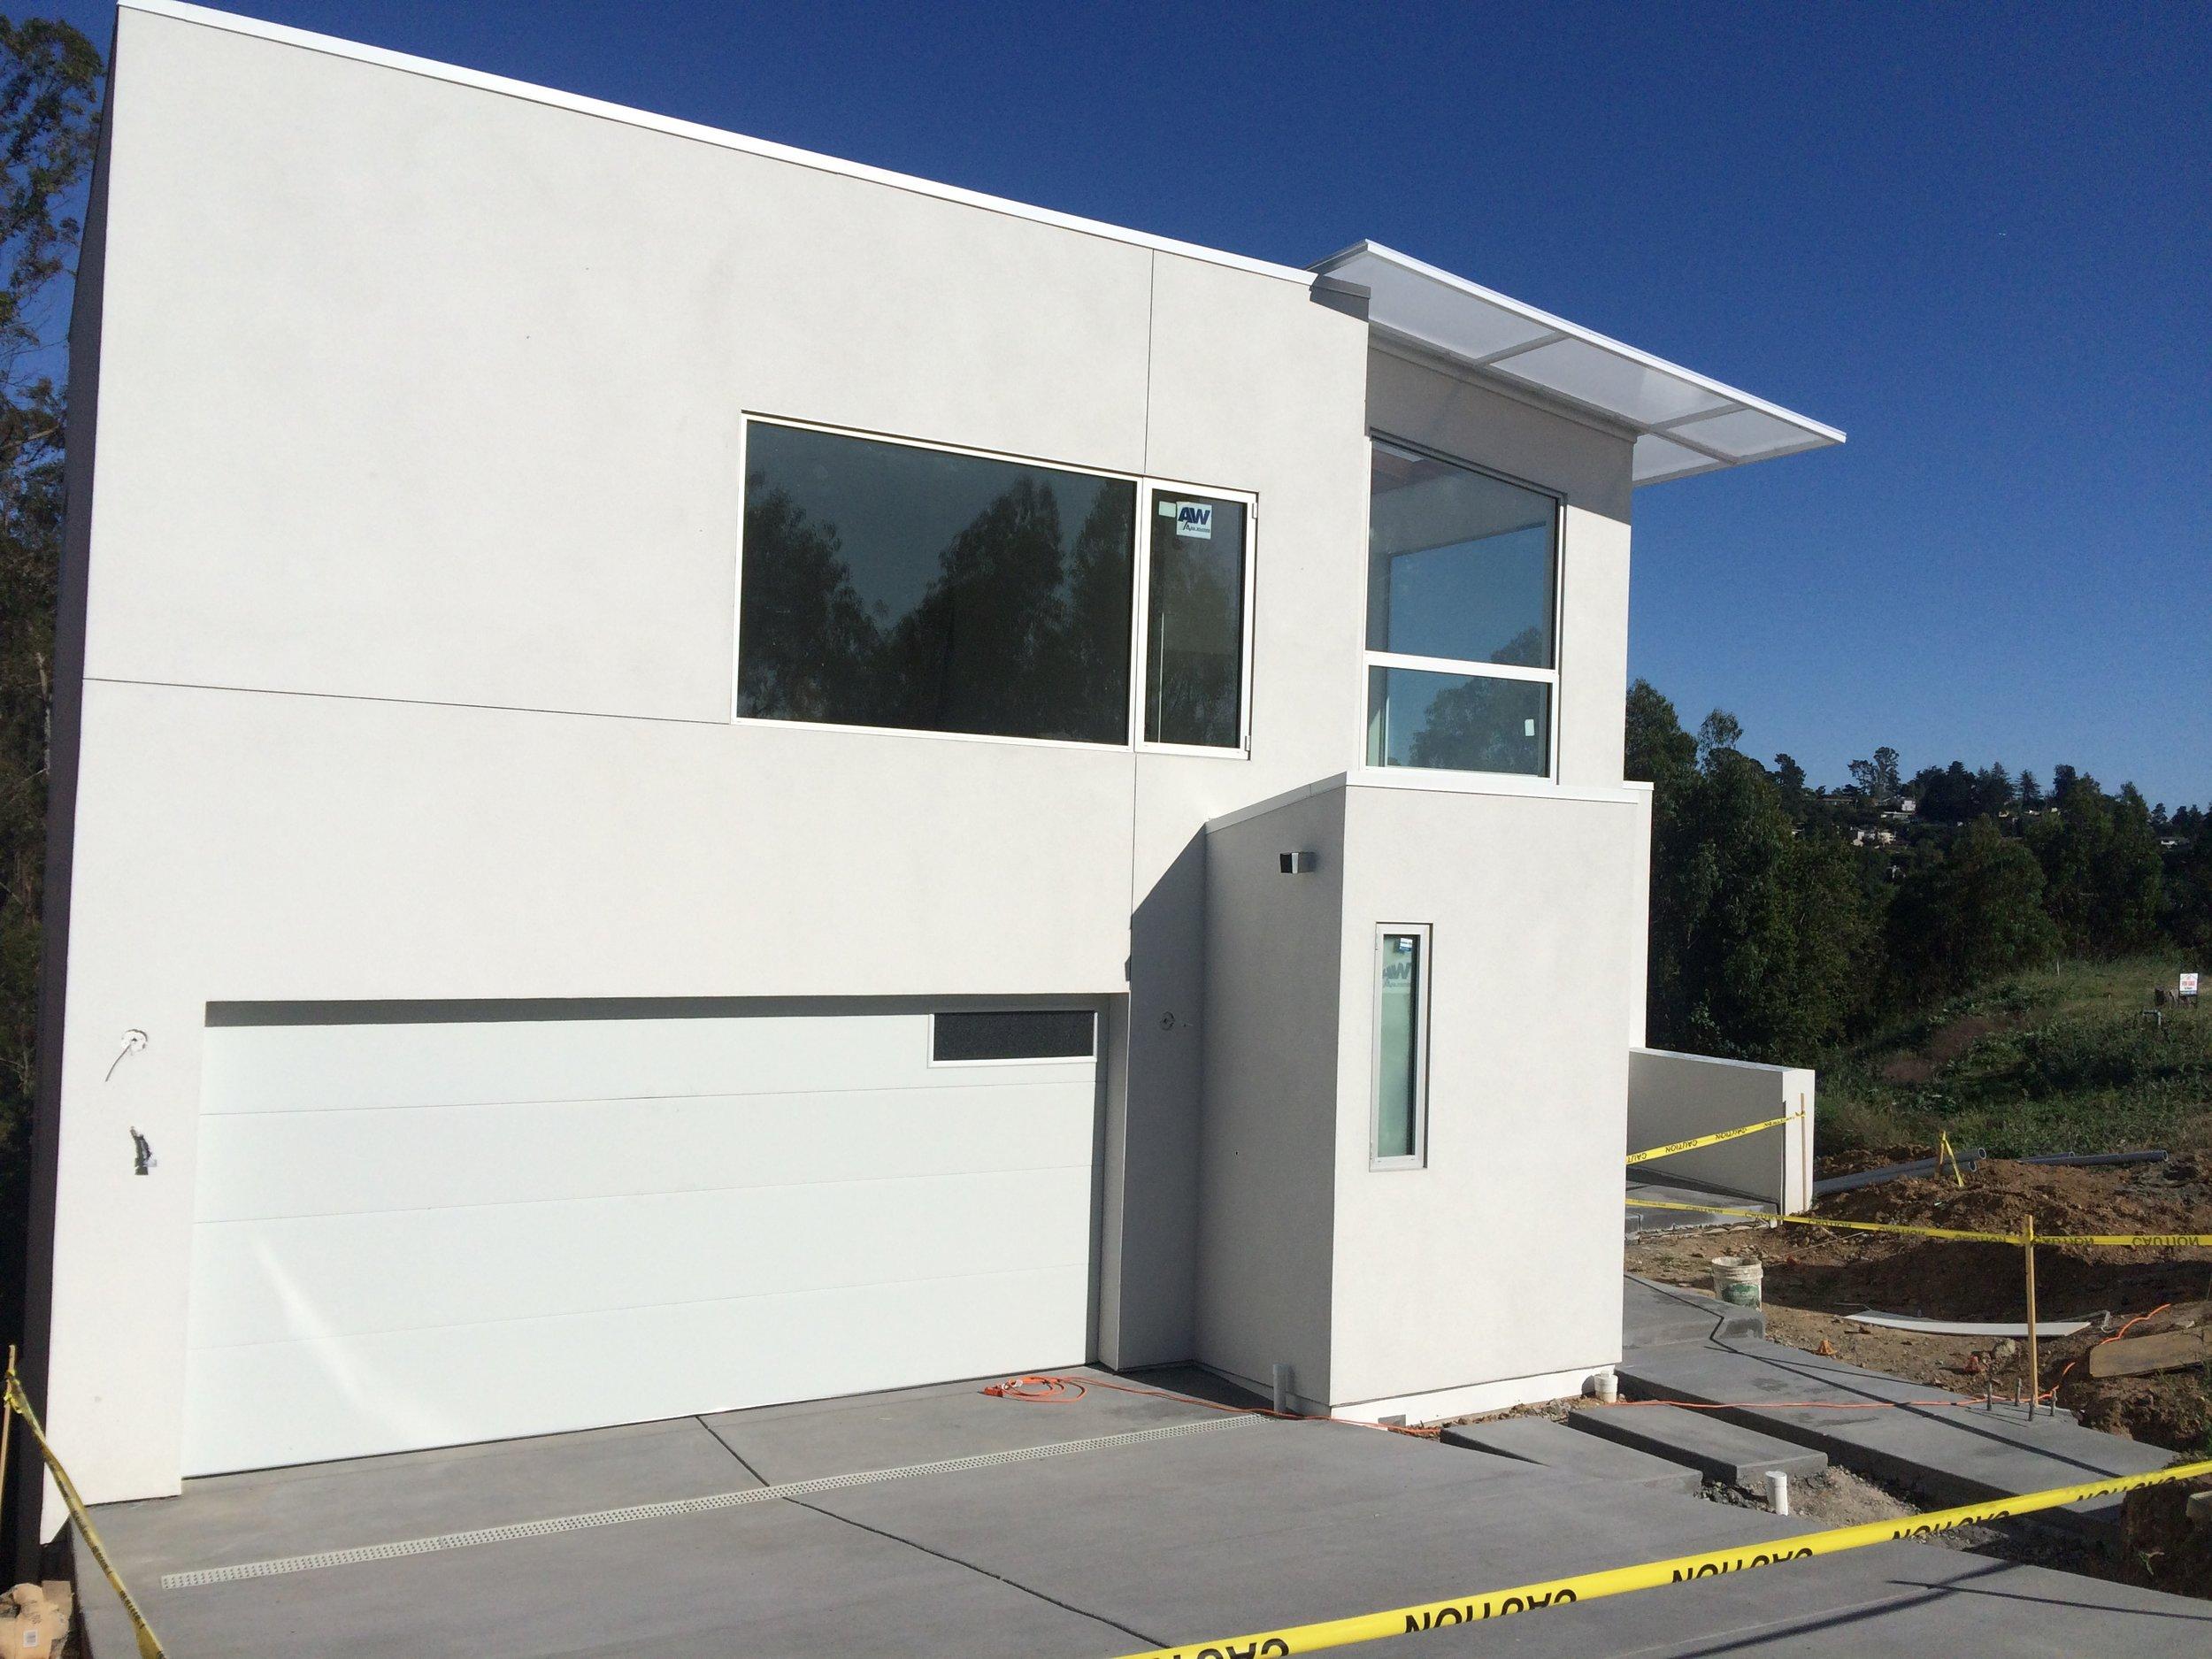 All Bay Garage Doors - Flush Panel Garage Doors - Kevin Chervatin - 51.JPG